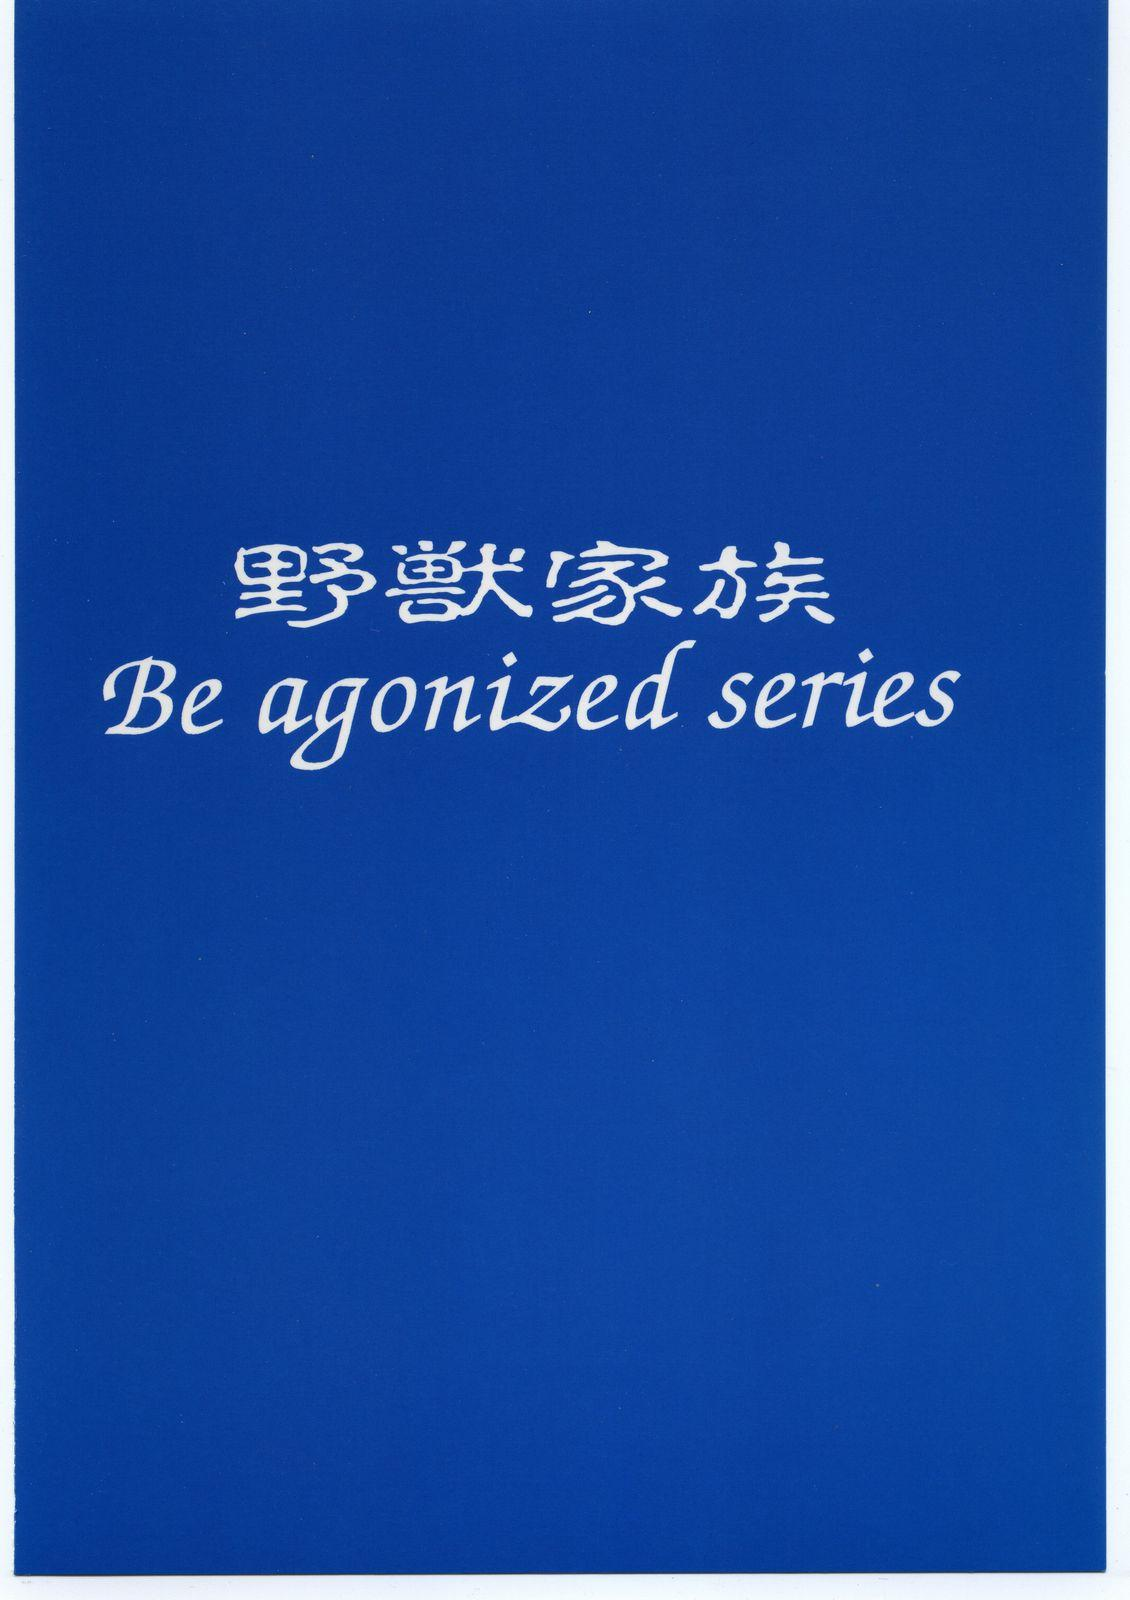 Be Agonized Vol 2.0 57